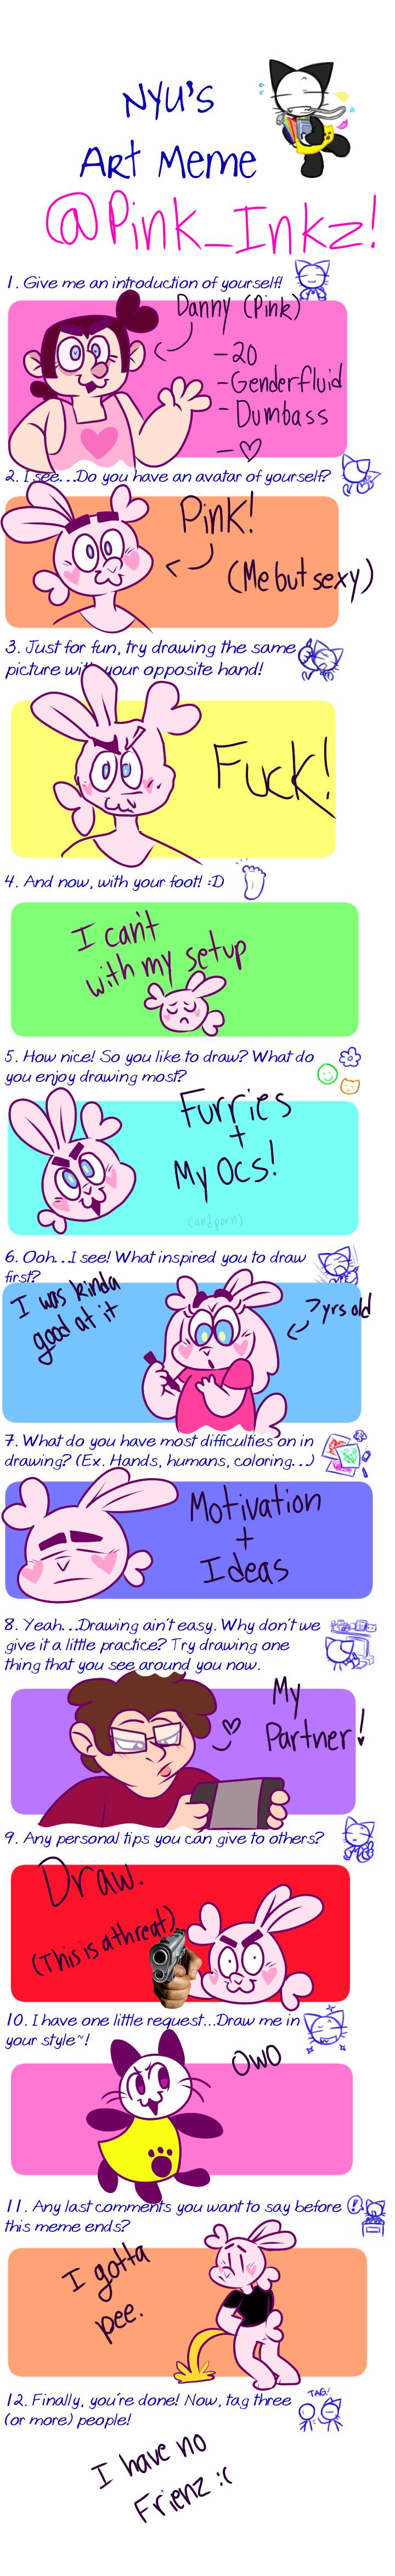 Nyu's Art Meme (Pink_Inkz addition)